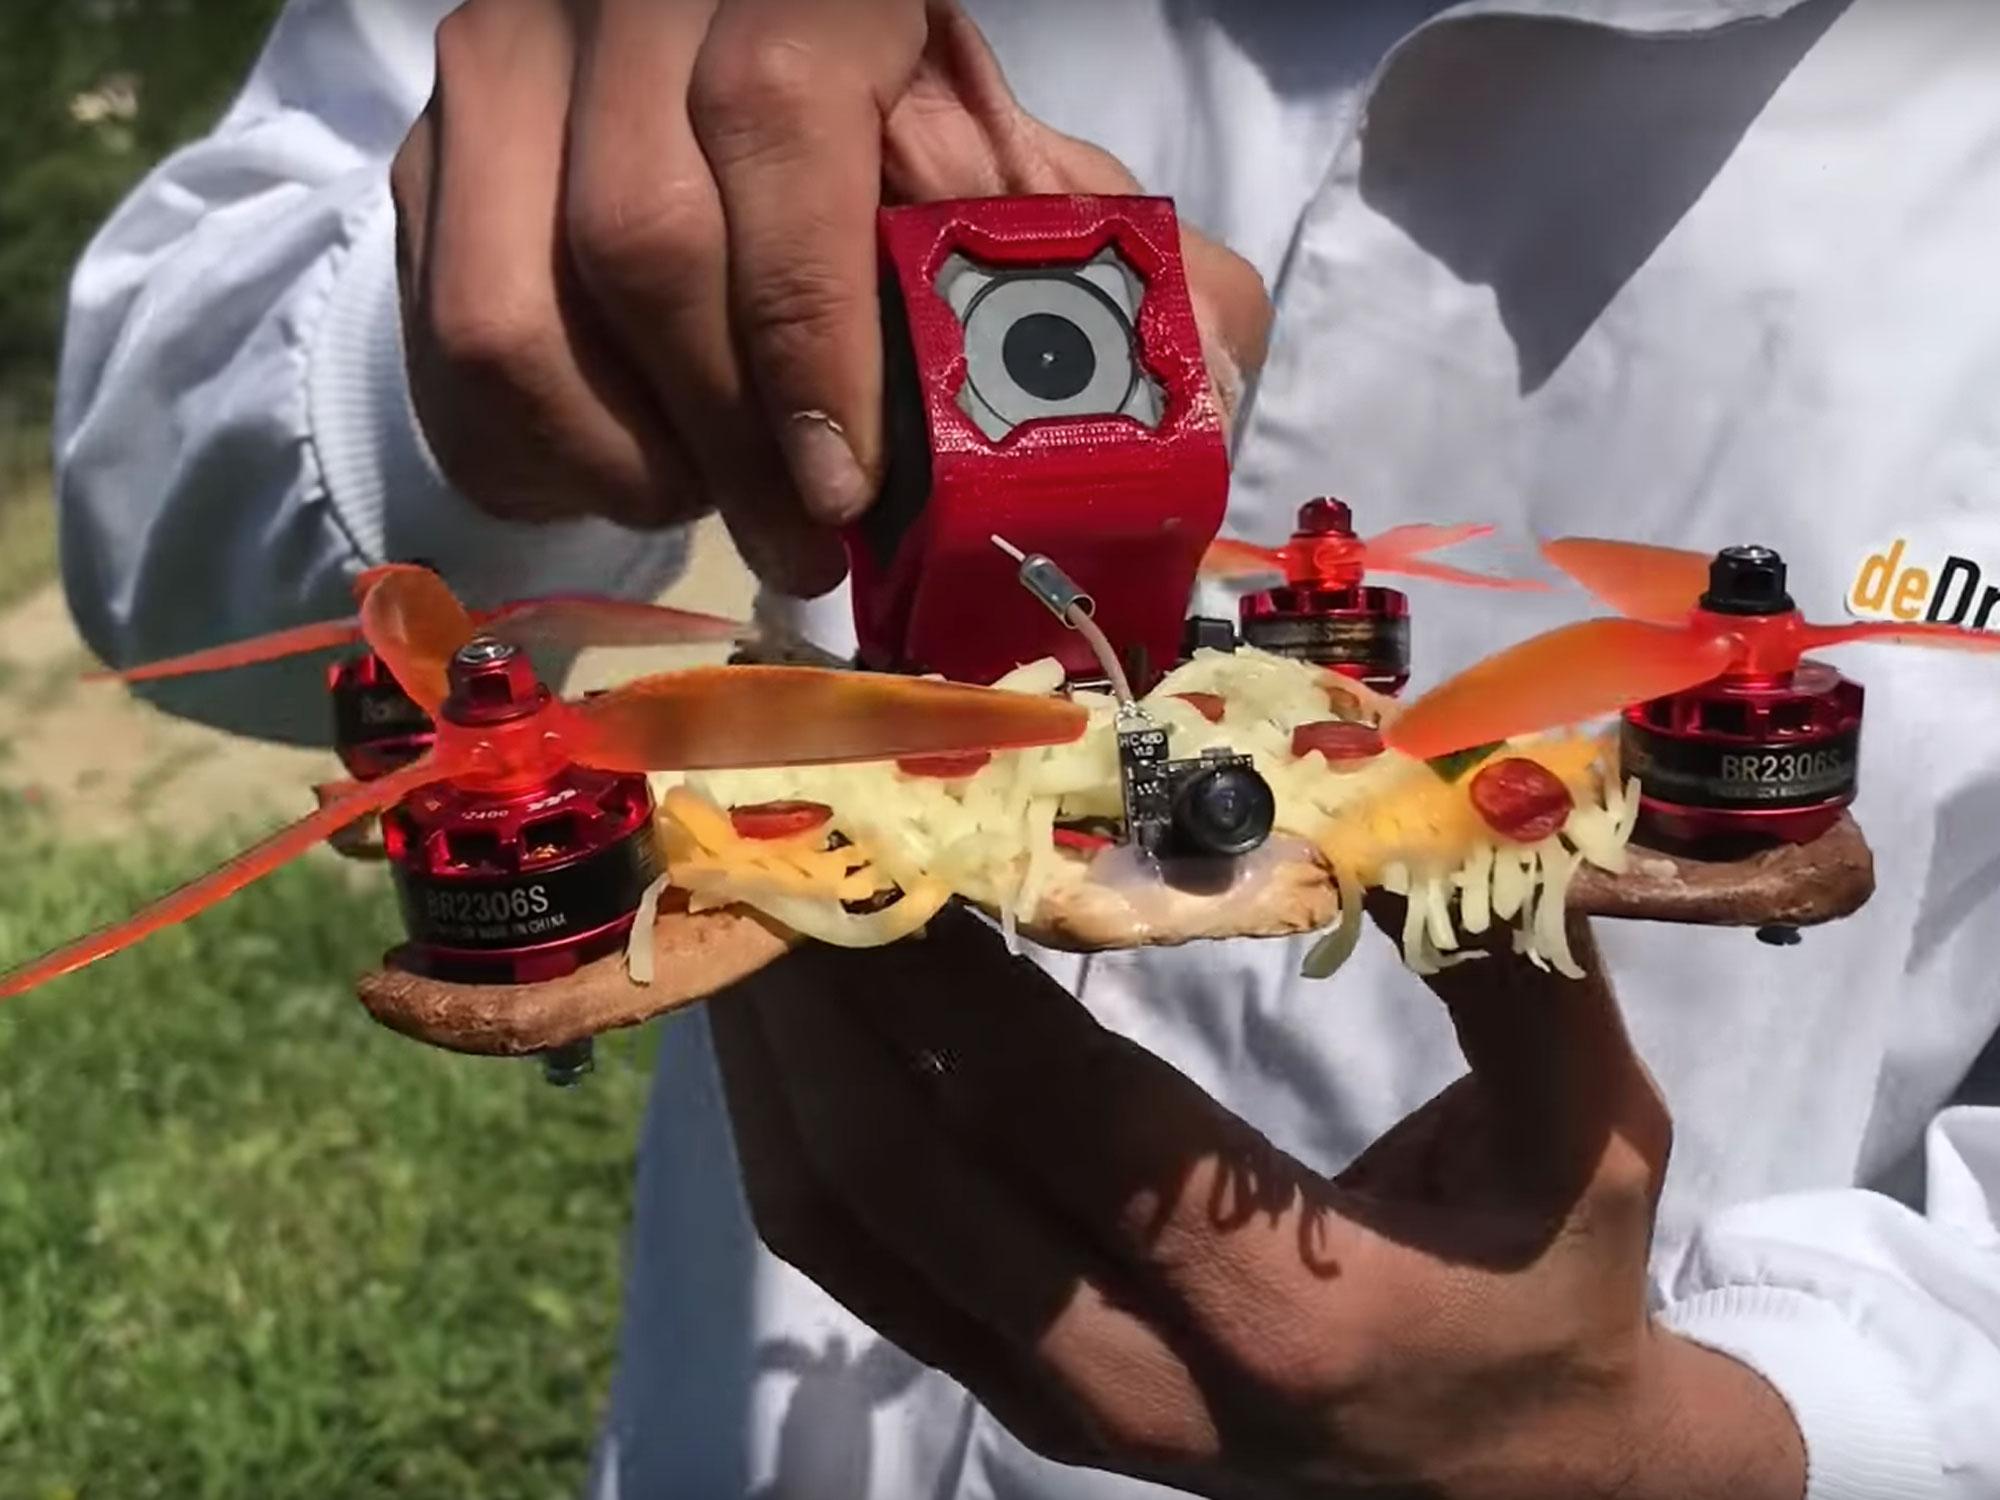 pizza-drone.jpg